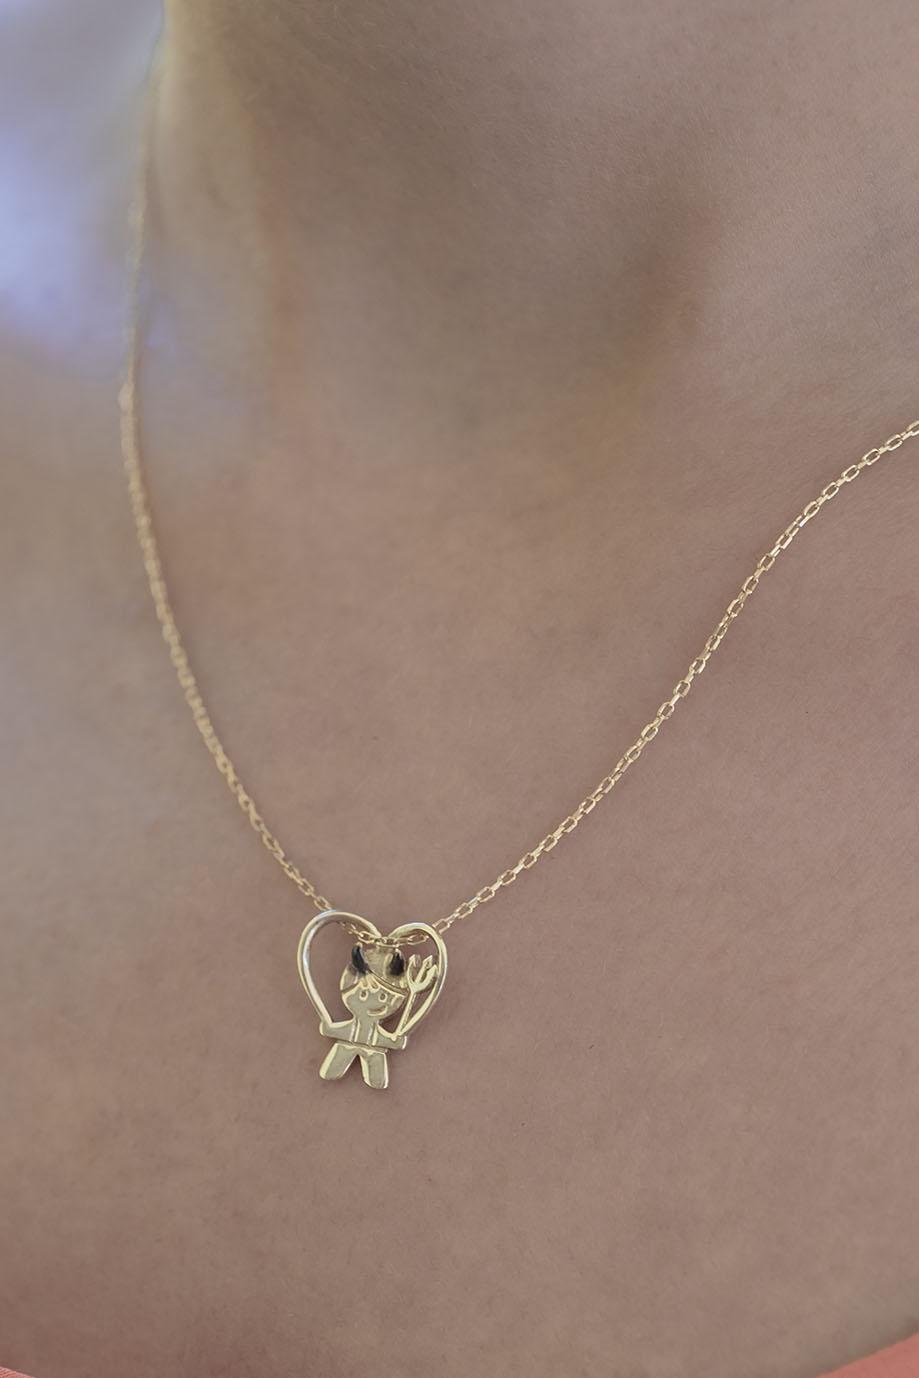 He Devil Necklace For Boy Mother Pendant Necklace App Discover our wide range of unique golden & silver personalized necklaces, rings, bracelets and more. atelier petites pierres